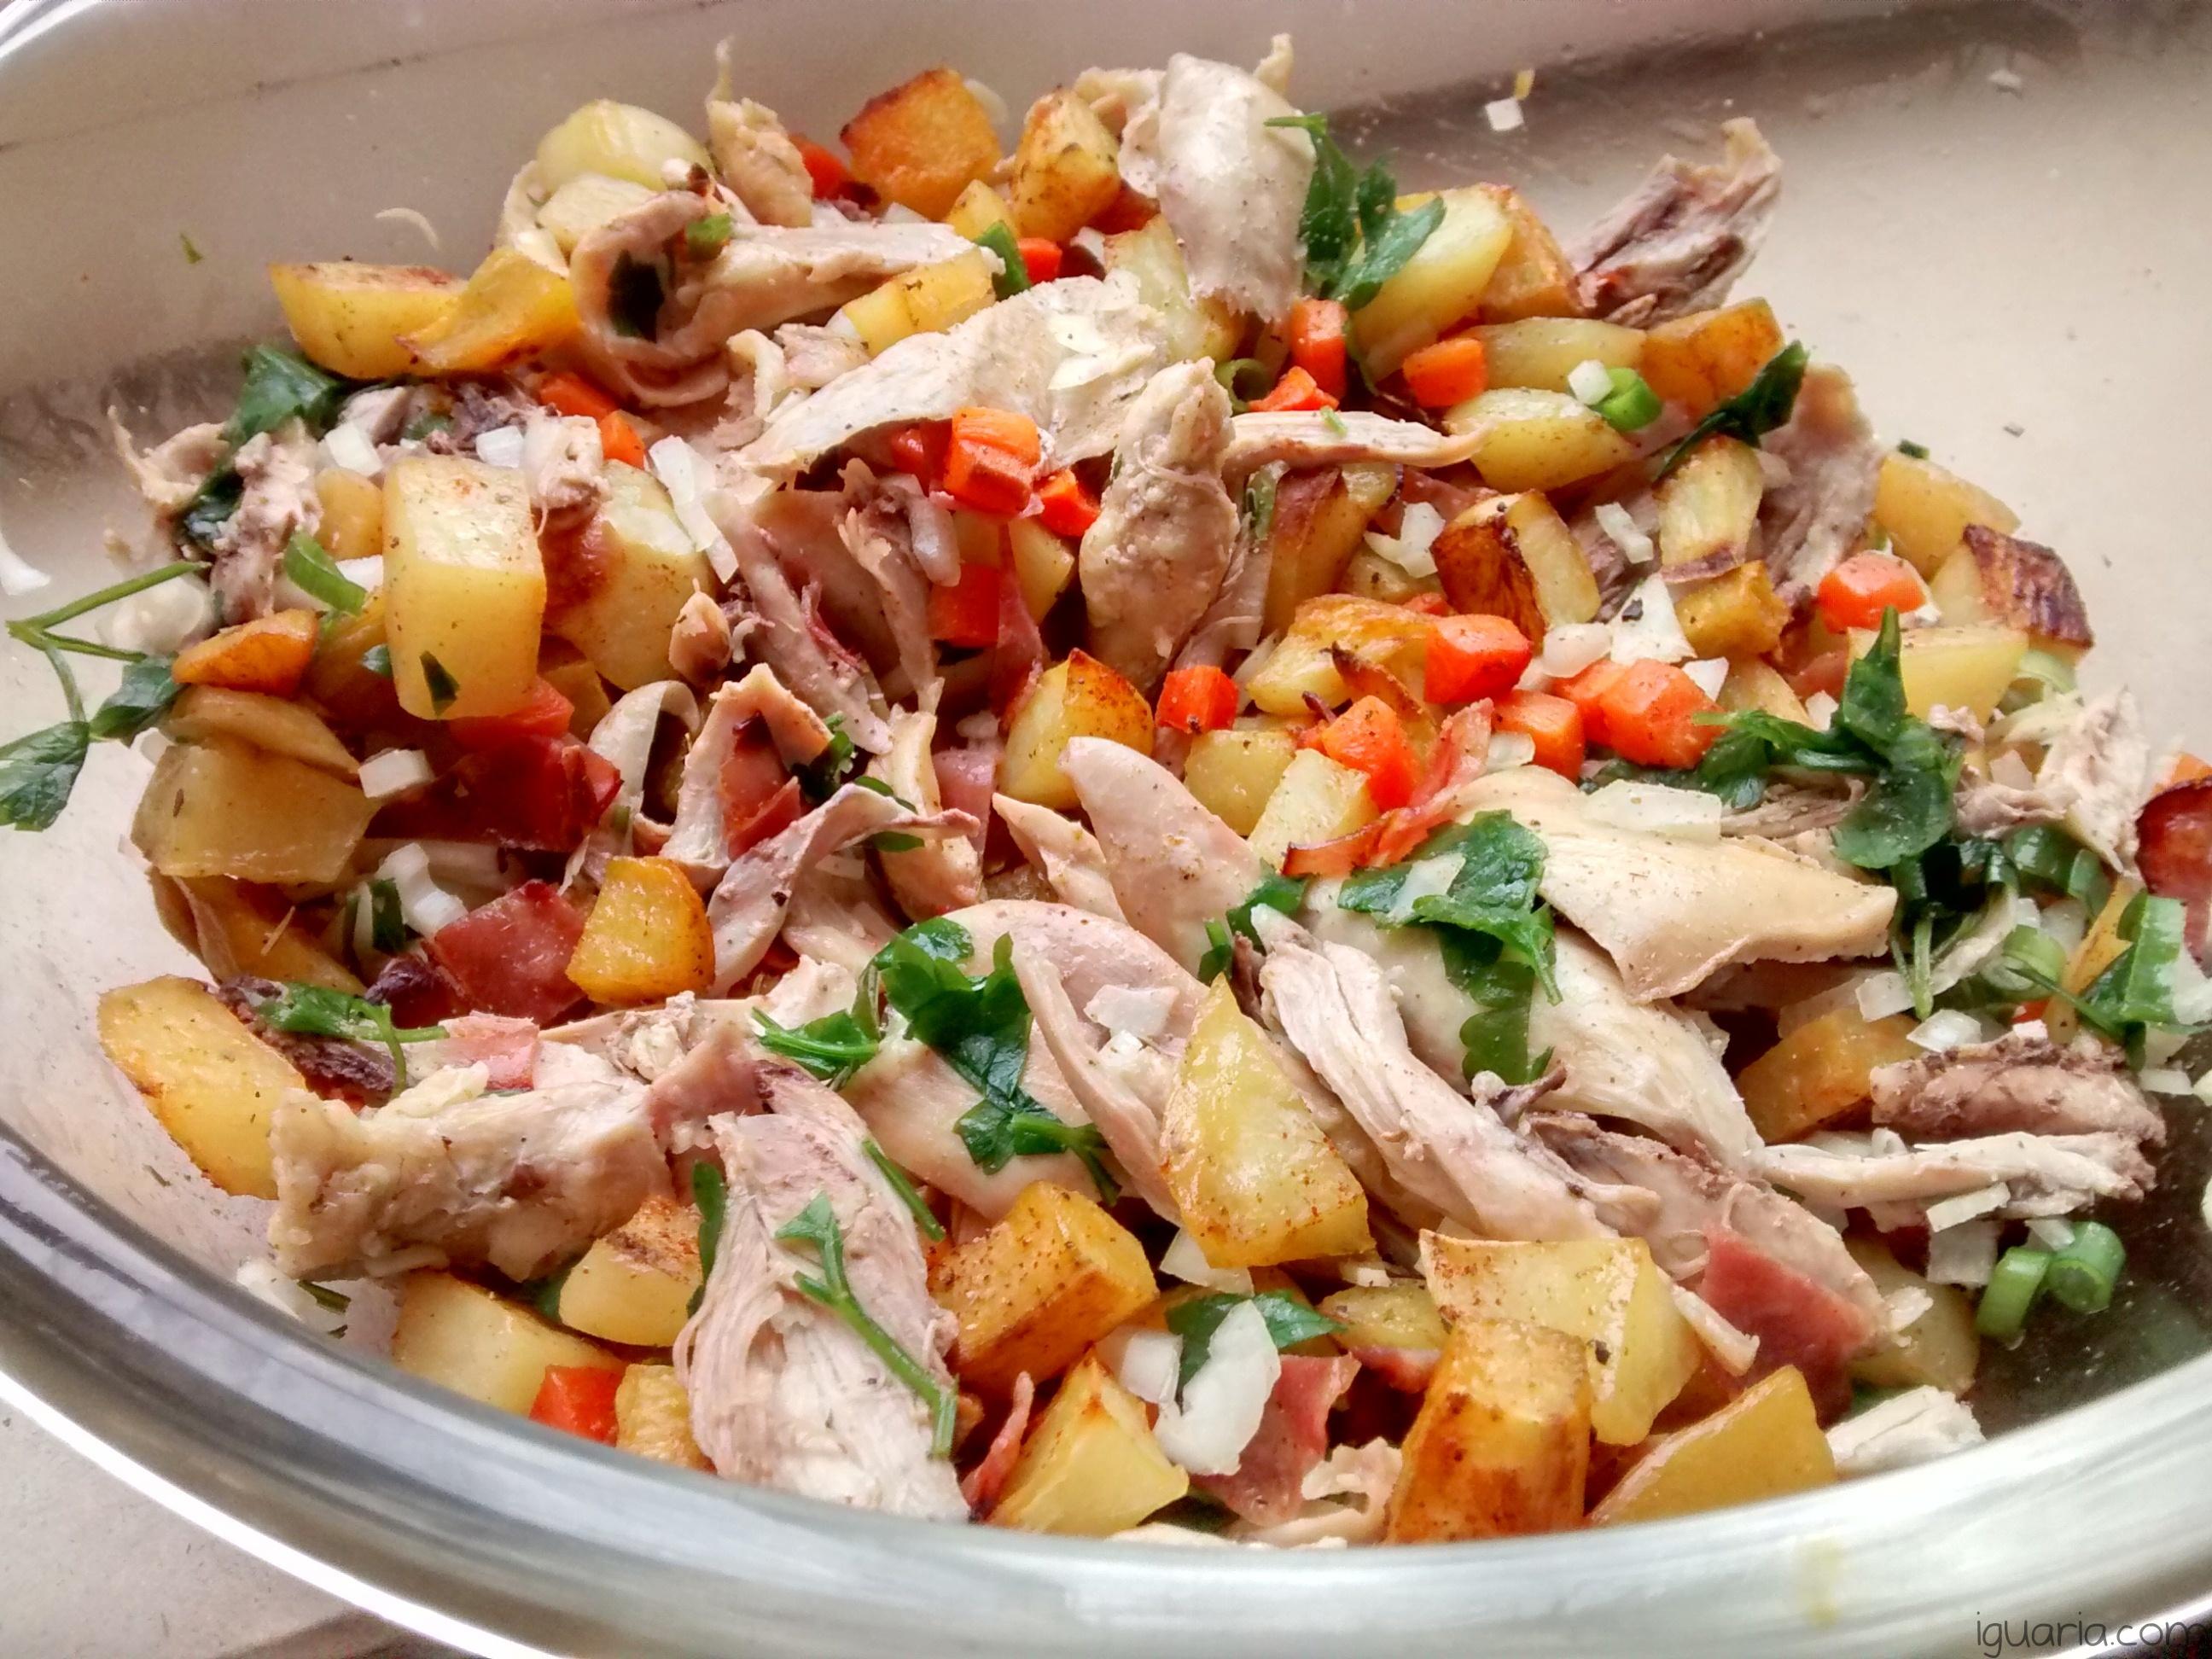 iguaria-salada-rica-de-frango